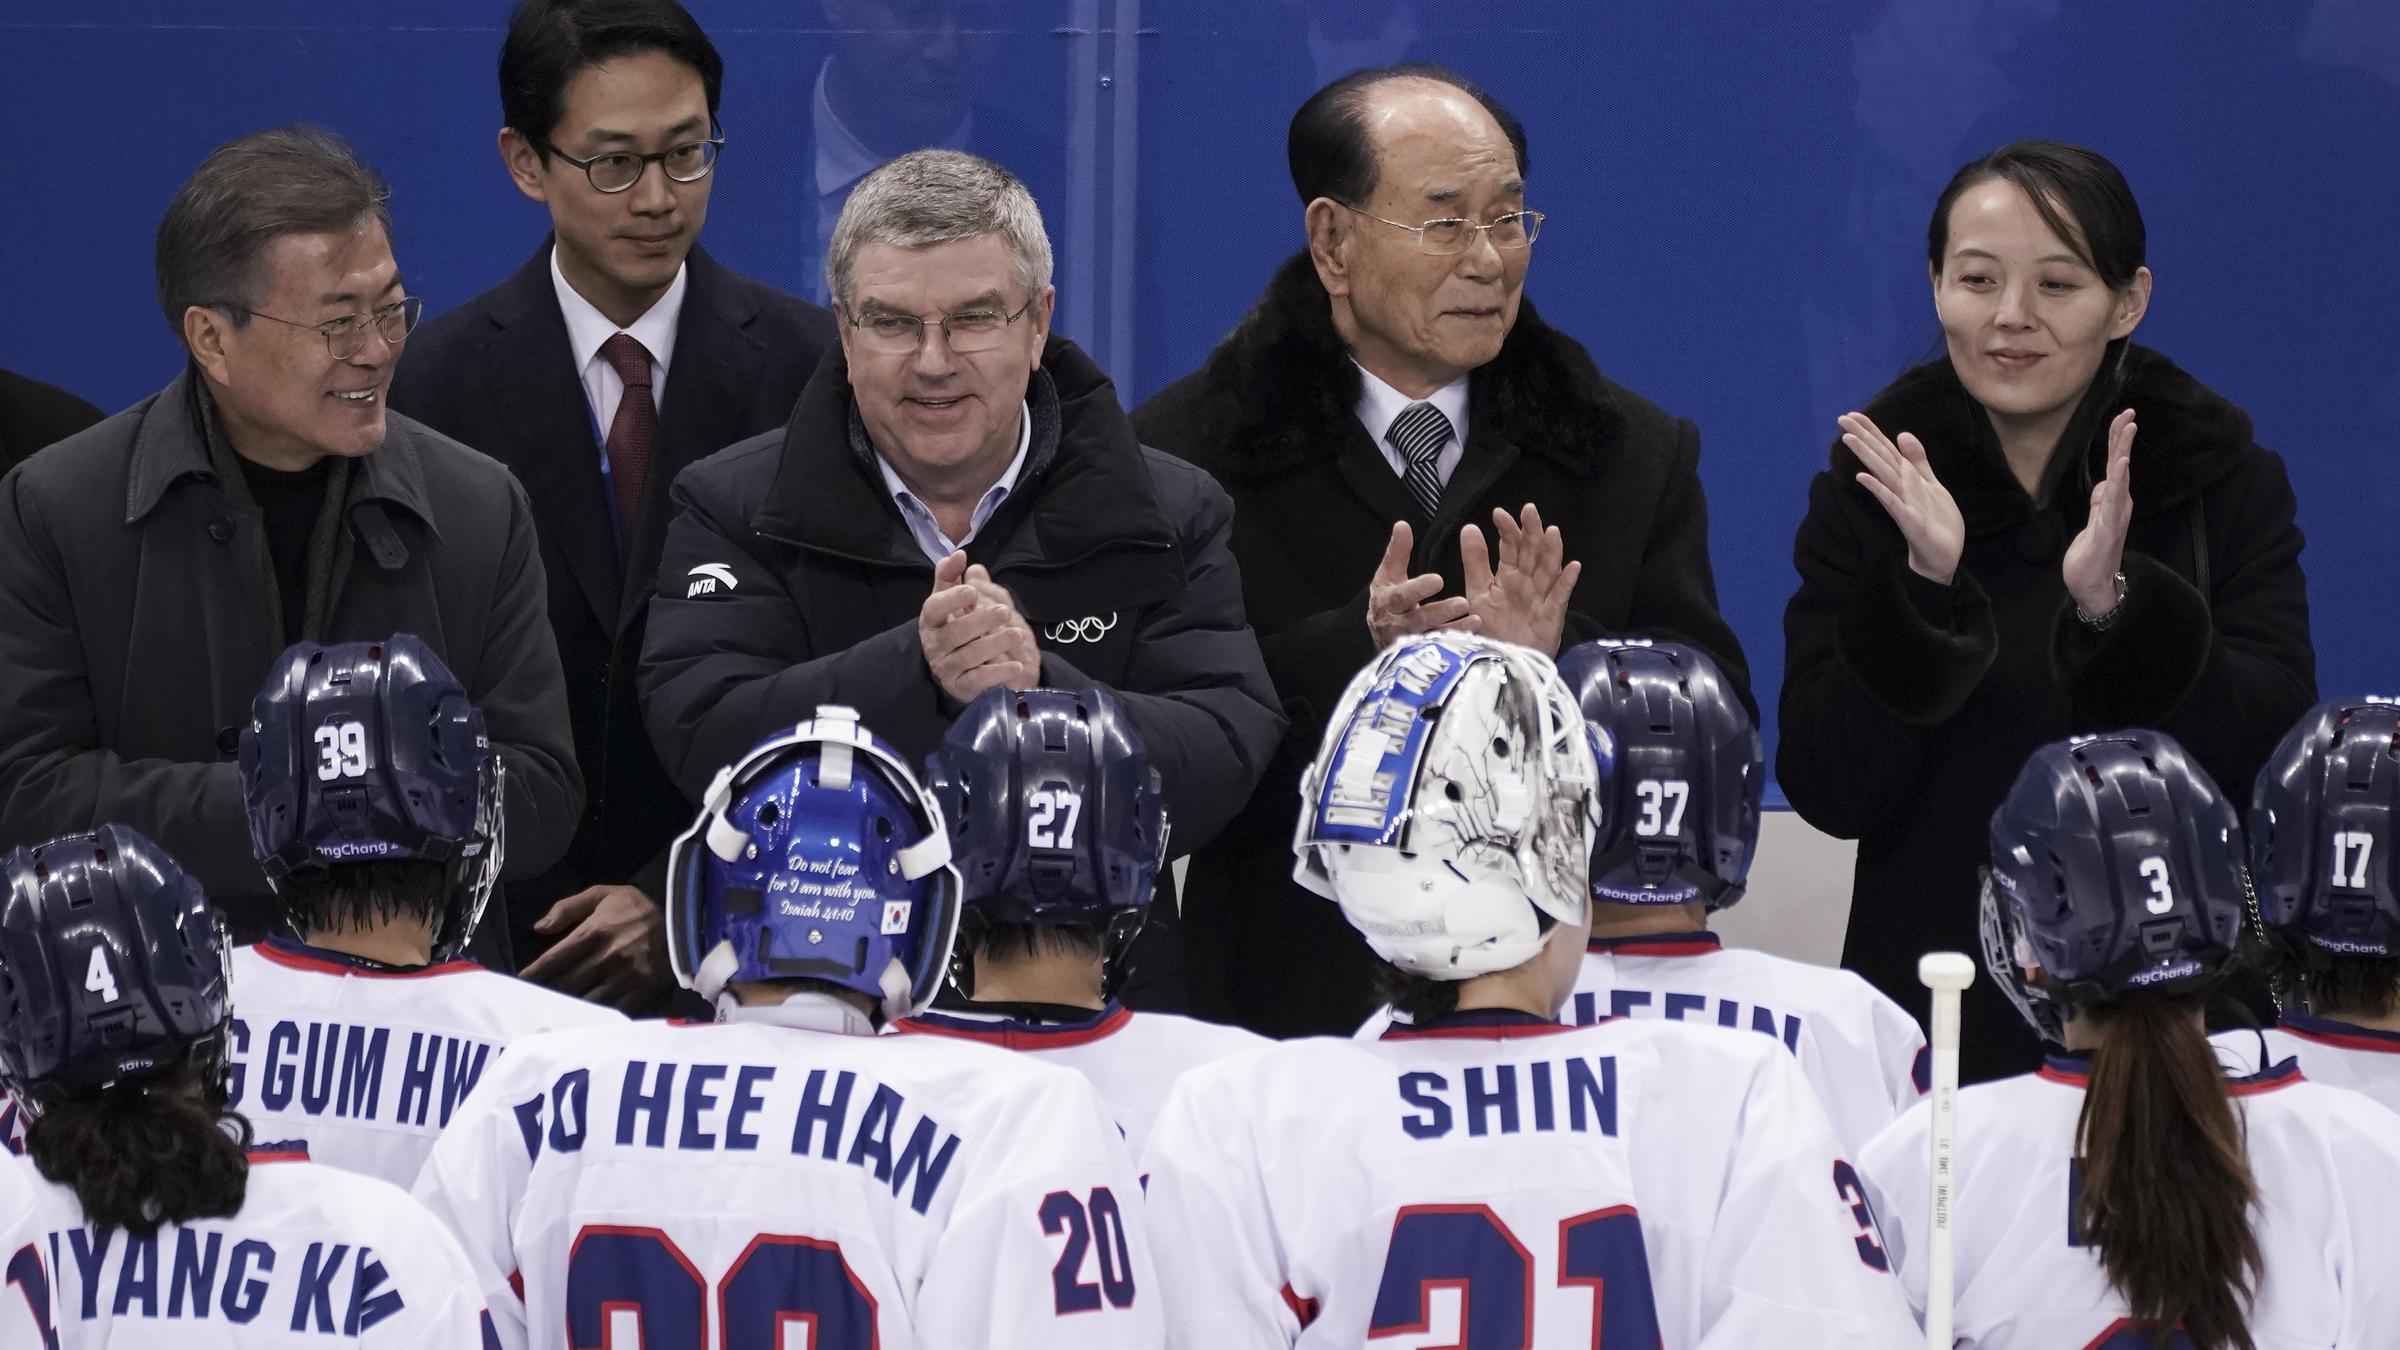 Kim Yo Jong Fascinates And Puzzles In South Korea 905 Wesa